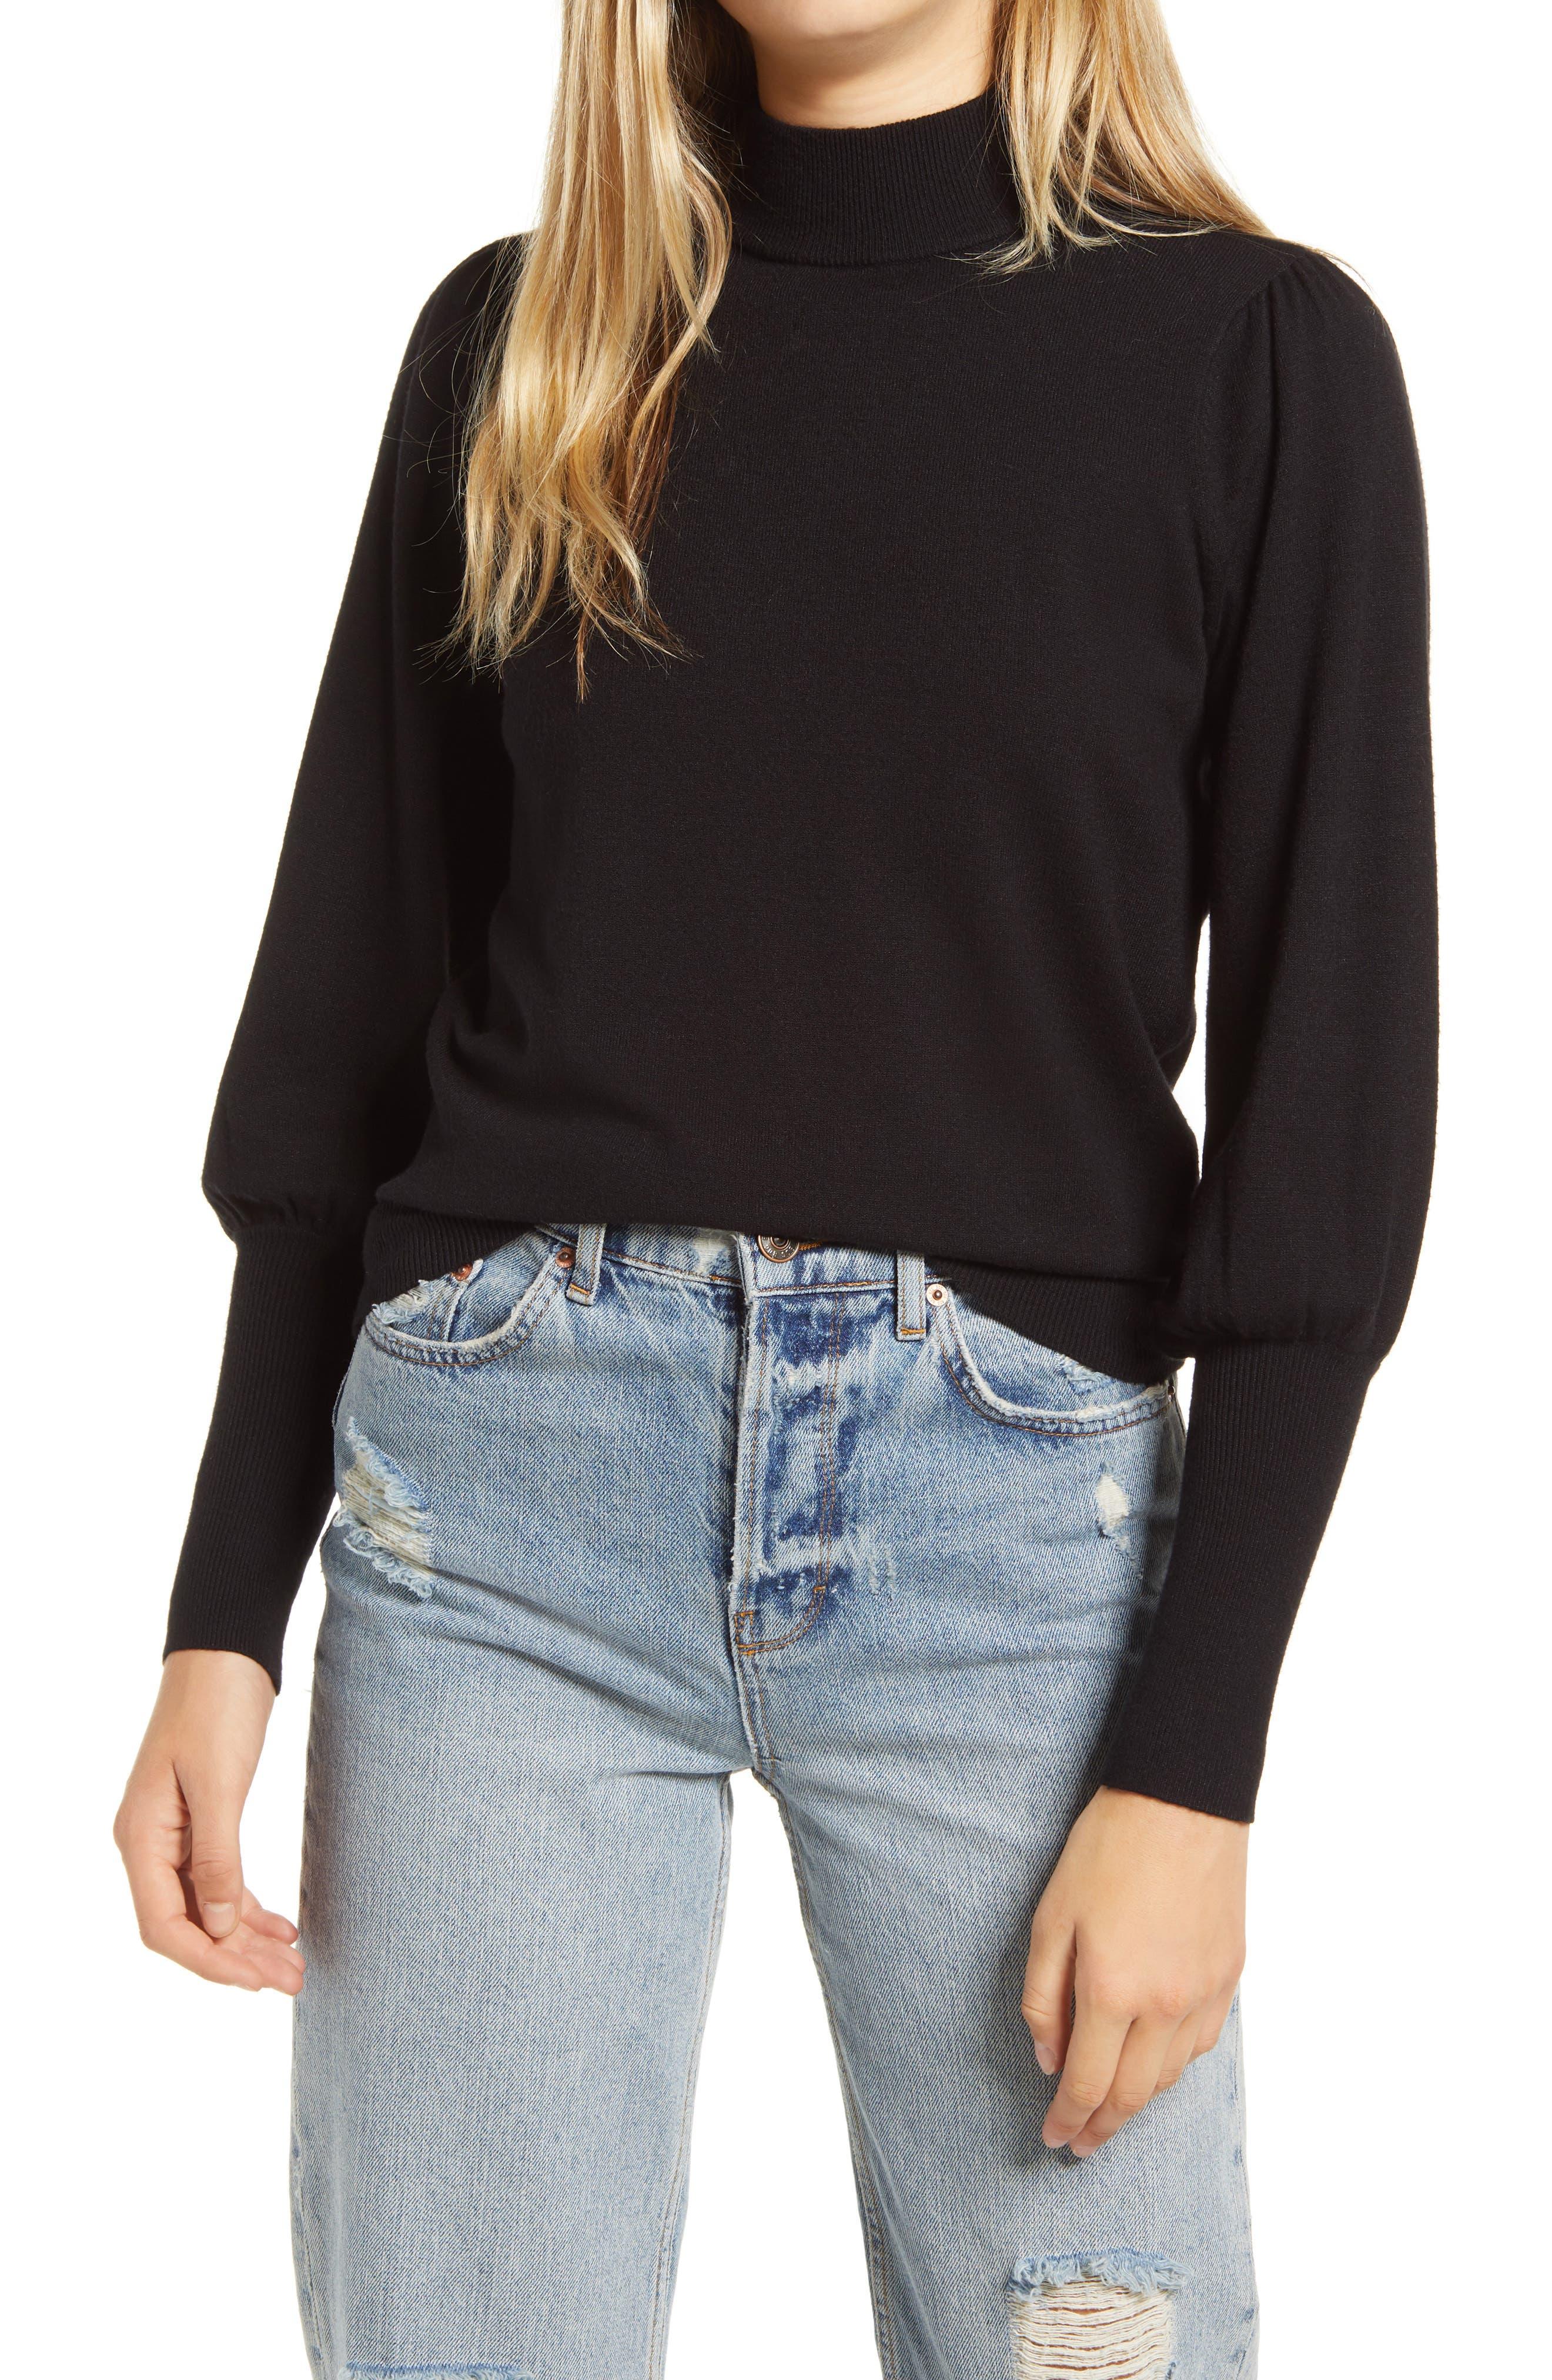 VERO MODA Juliet Sleeve Pullover Sweater | Nordstrom